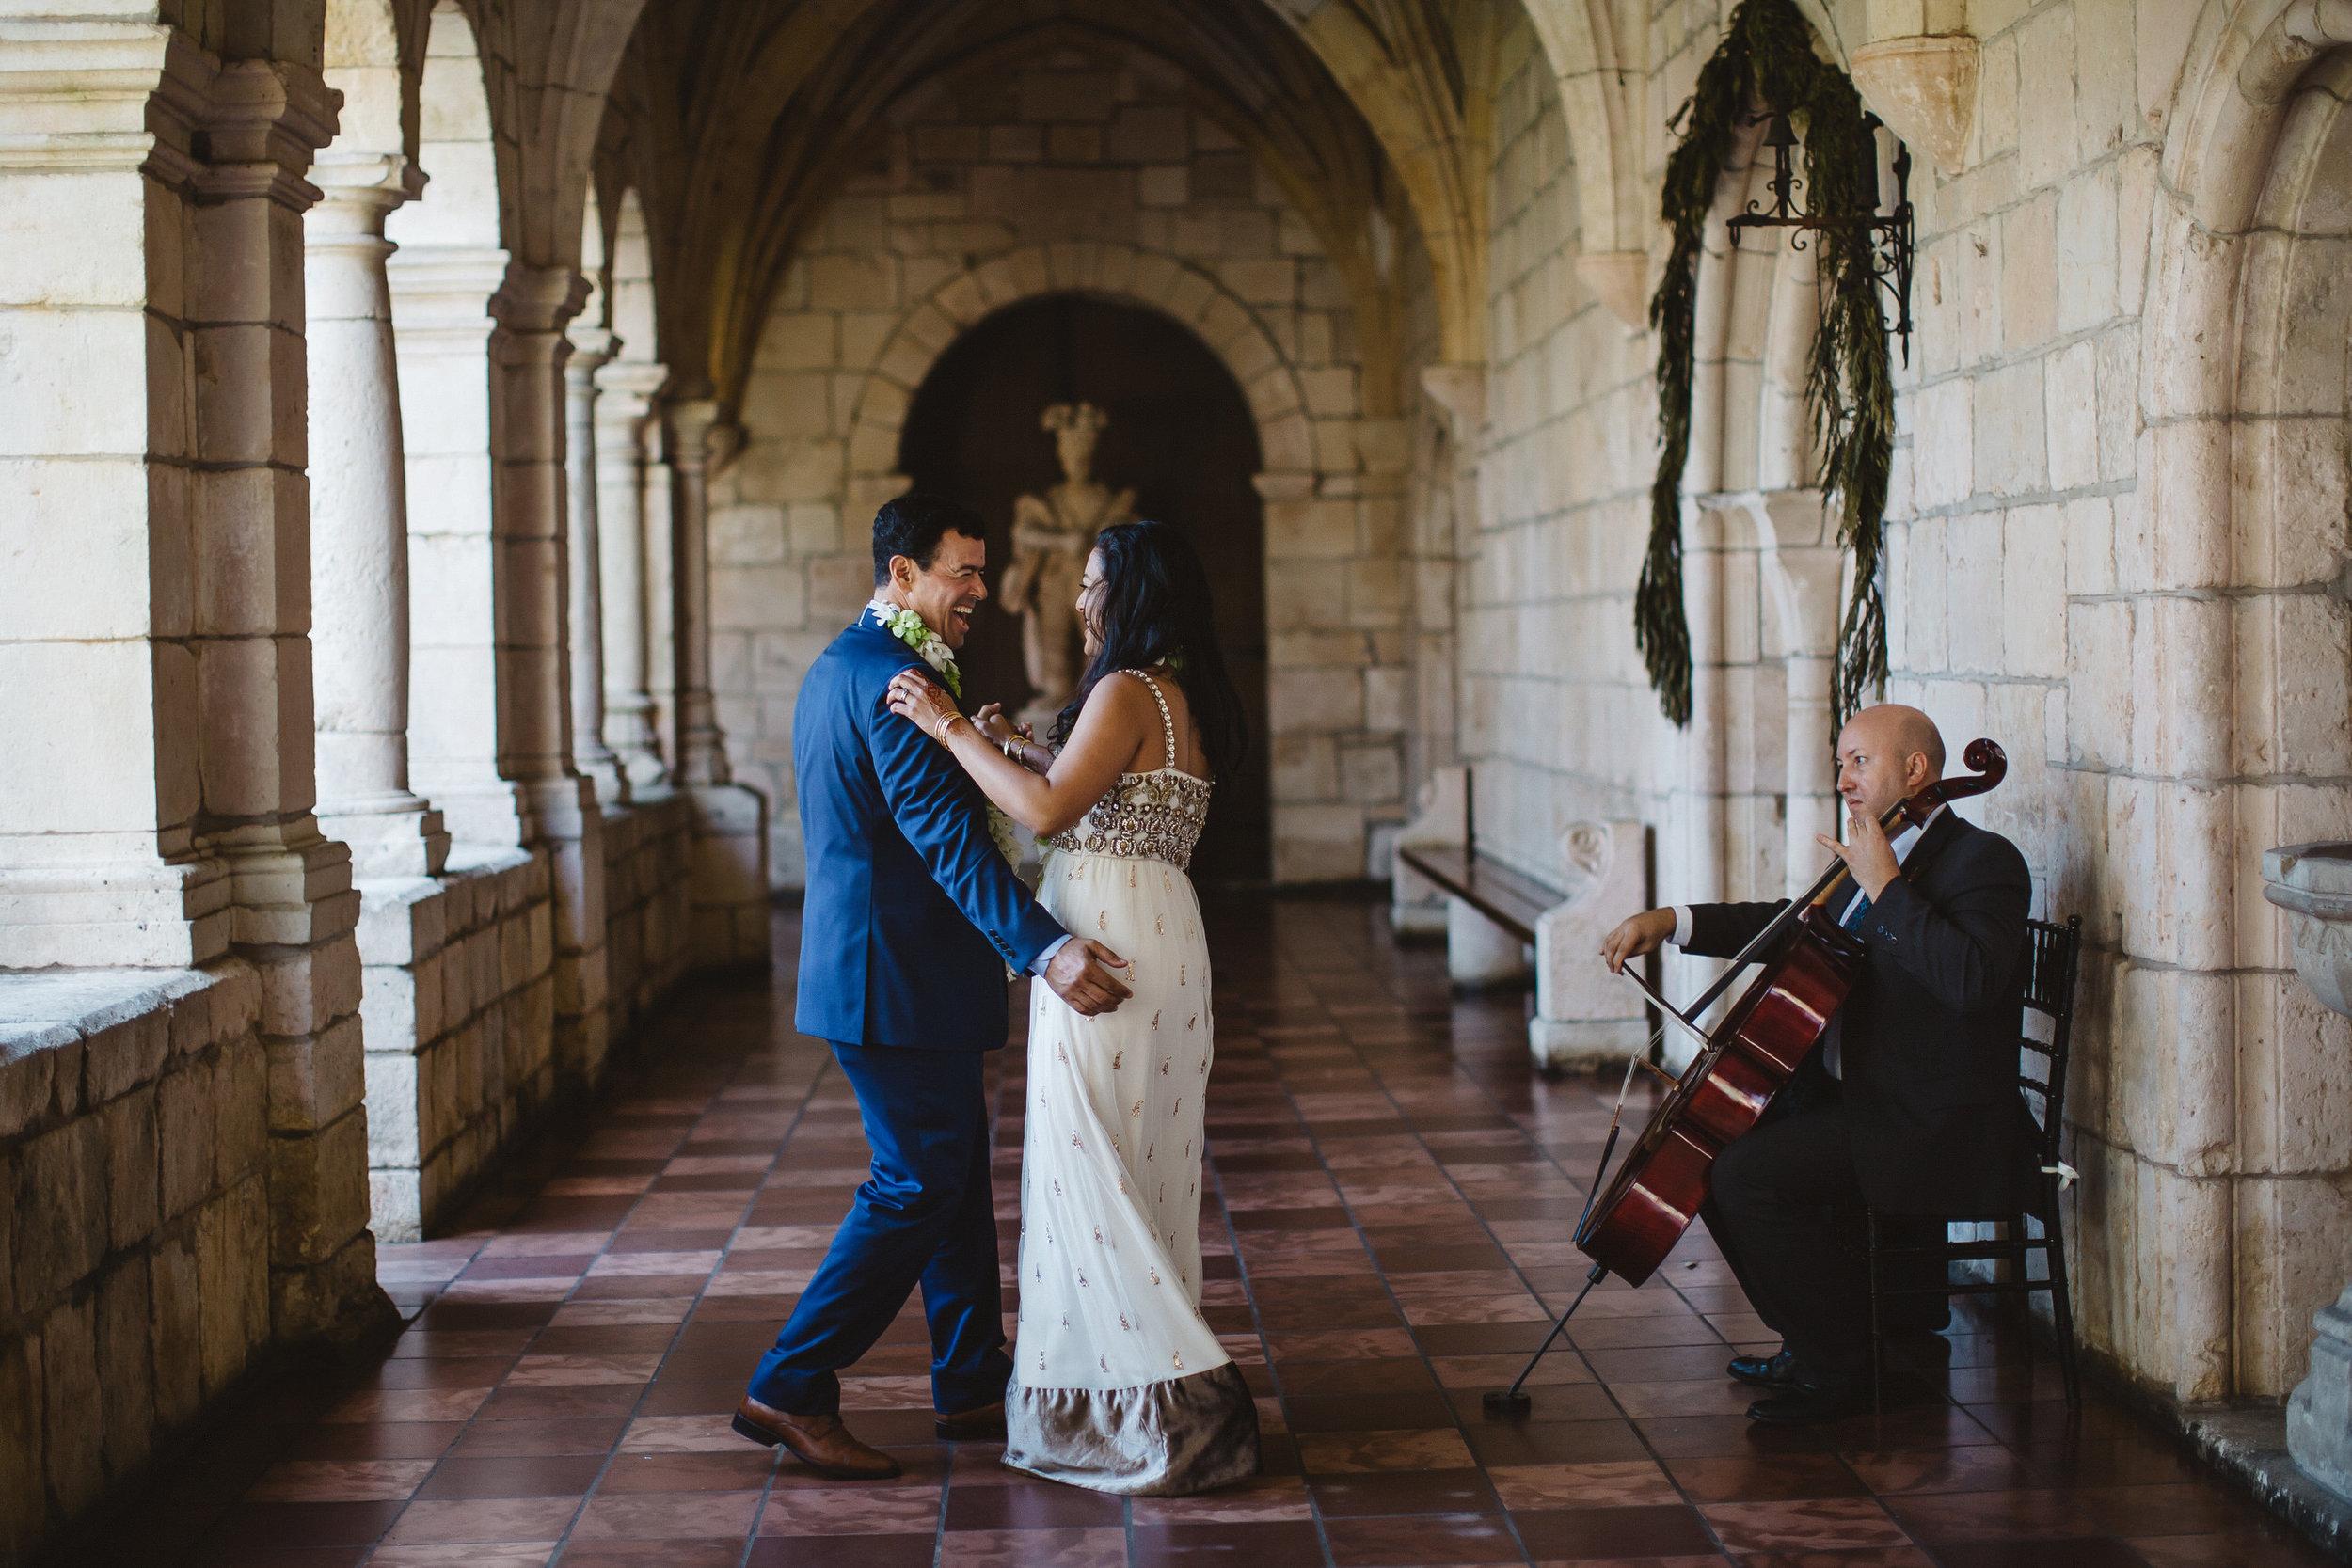 bride-and-groom-first-dance-spanish-monestary-tiny-house-photo.jpg